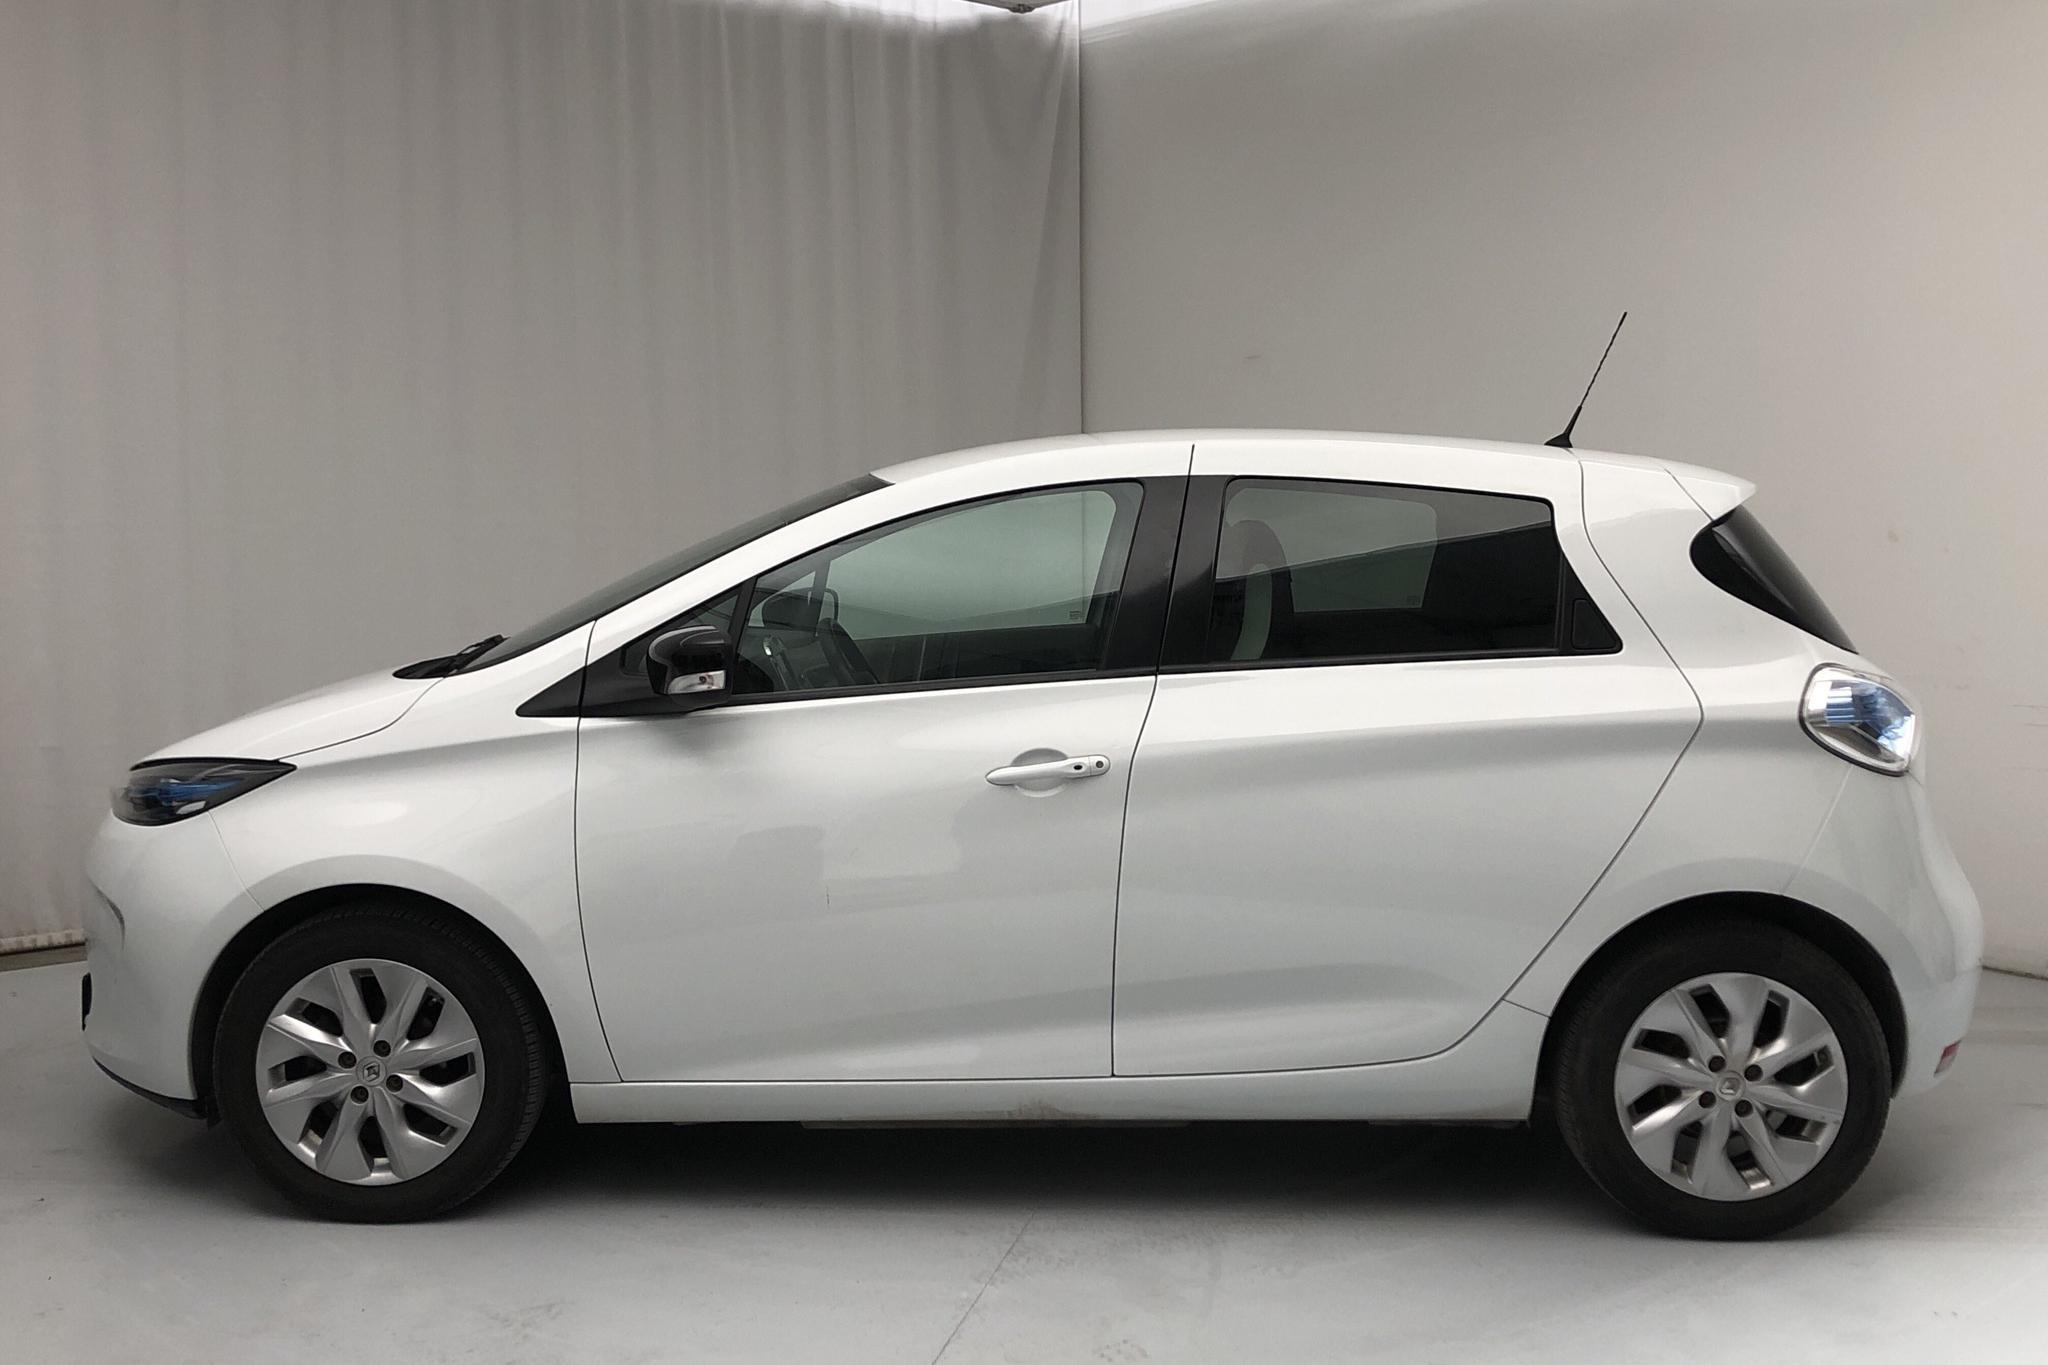 Renault Zoe 22 kWh (88hk) - 3 952 mil - Automat - vit - 2017